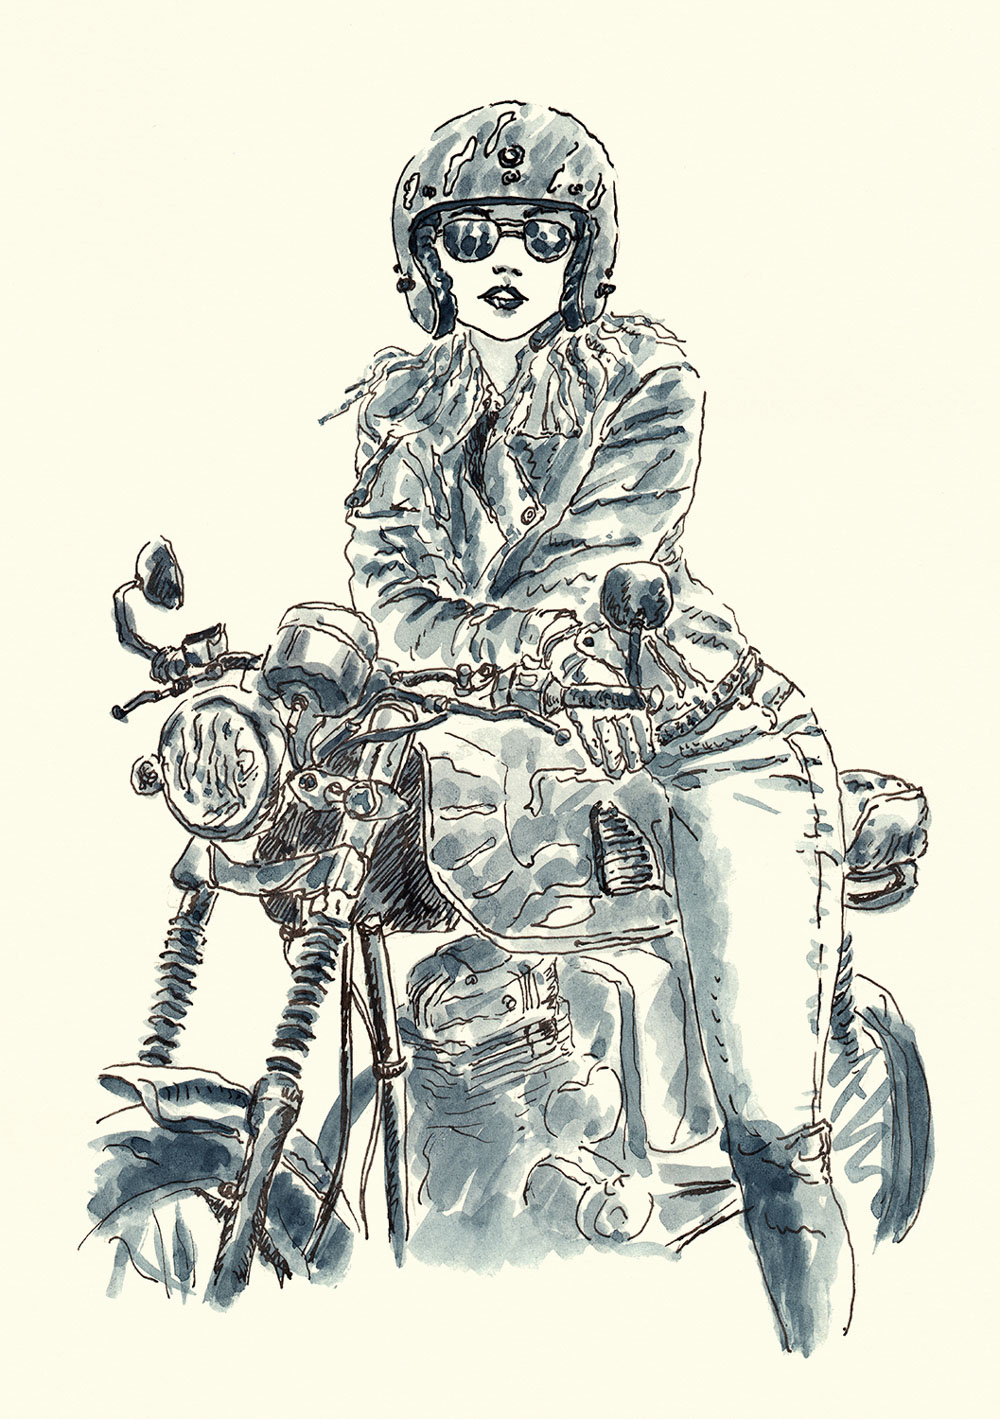 Lady Rider 200625